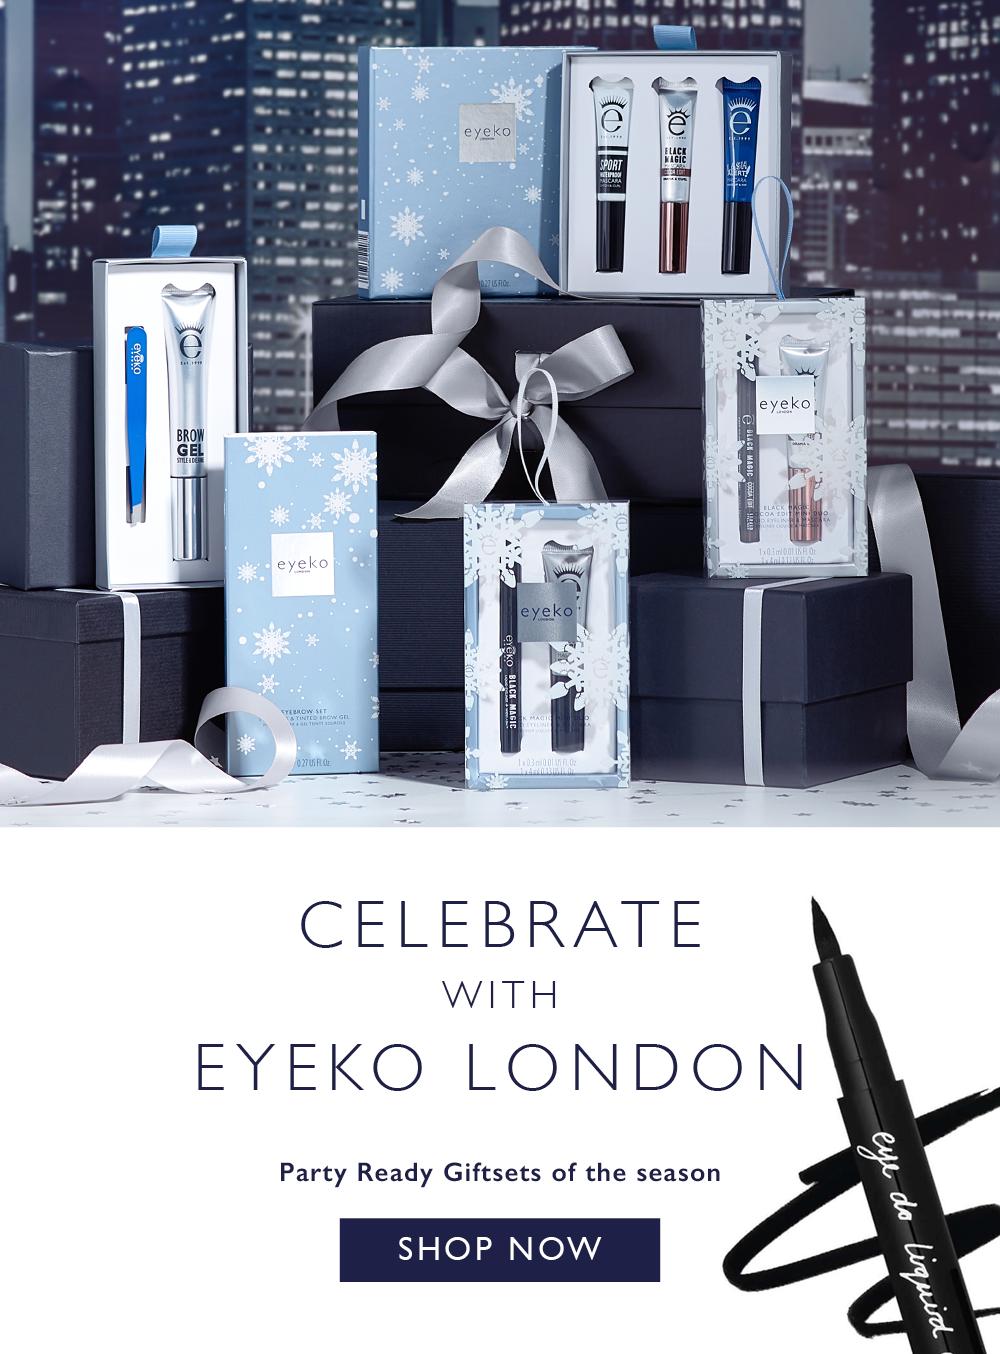 Celebrate Christmas with Eyeko London